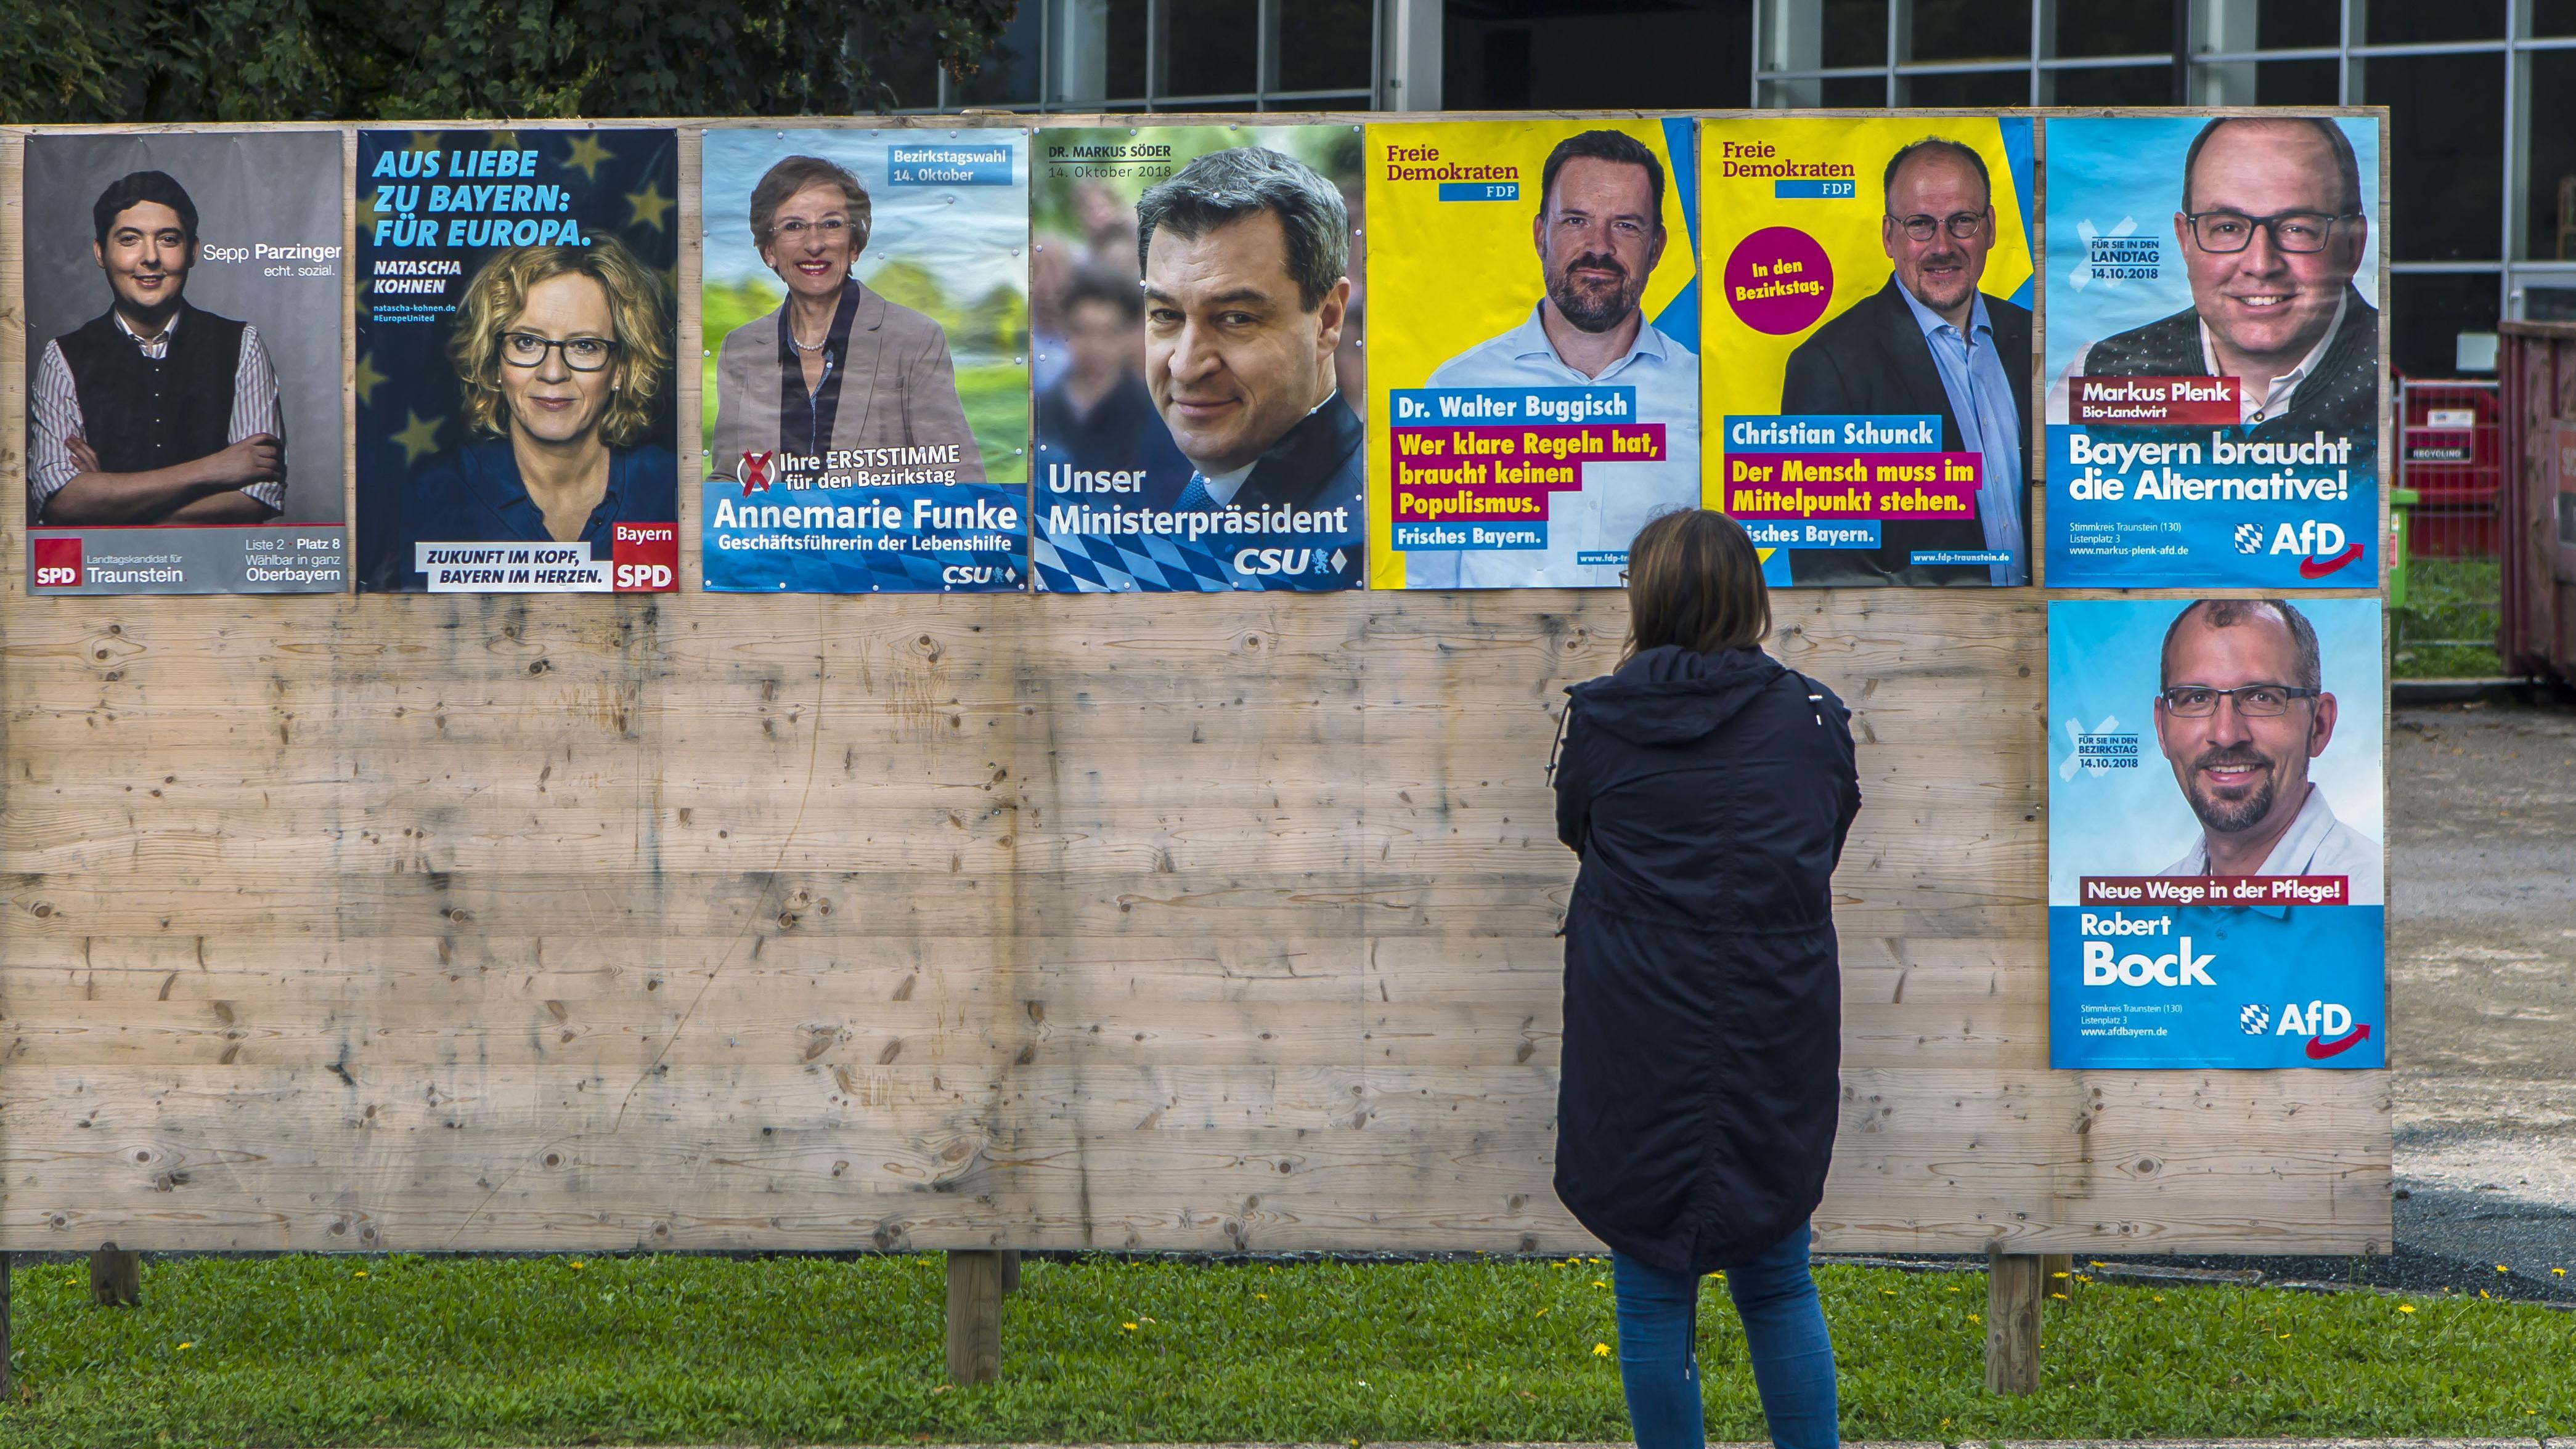 Frau betrachtet Wahlplakate